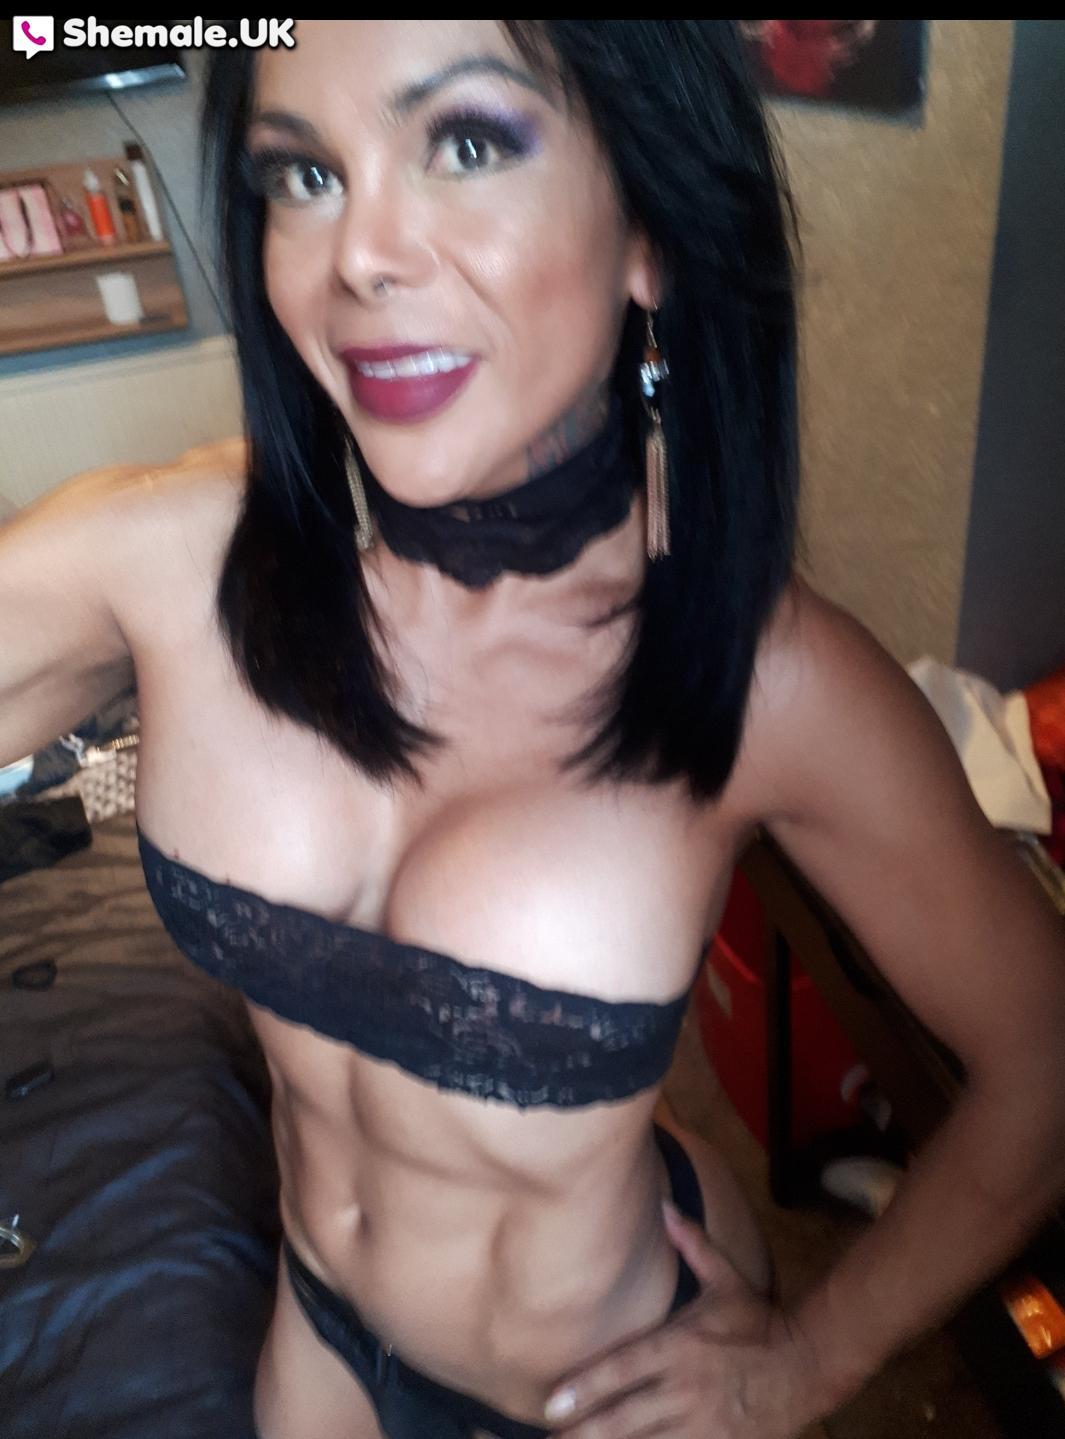 BDSM slaves sex dating apps uk free in Maryland